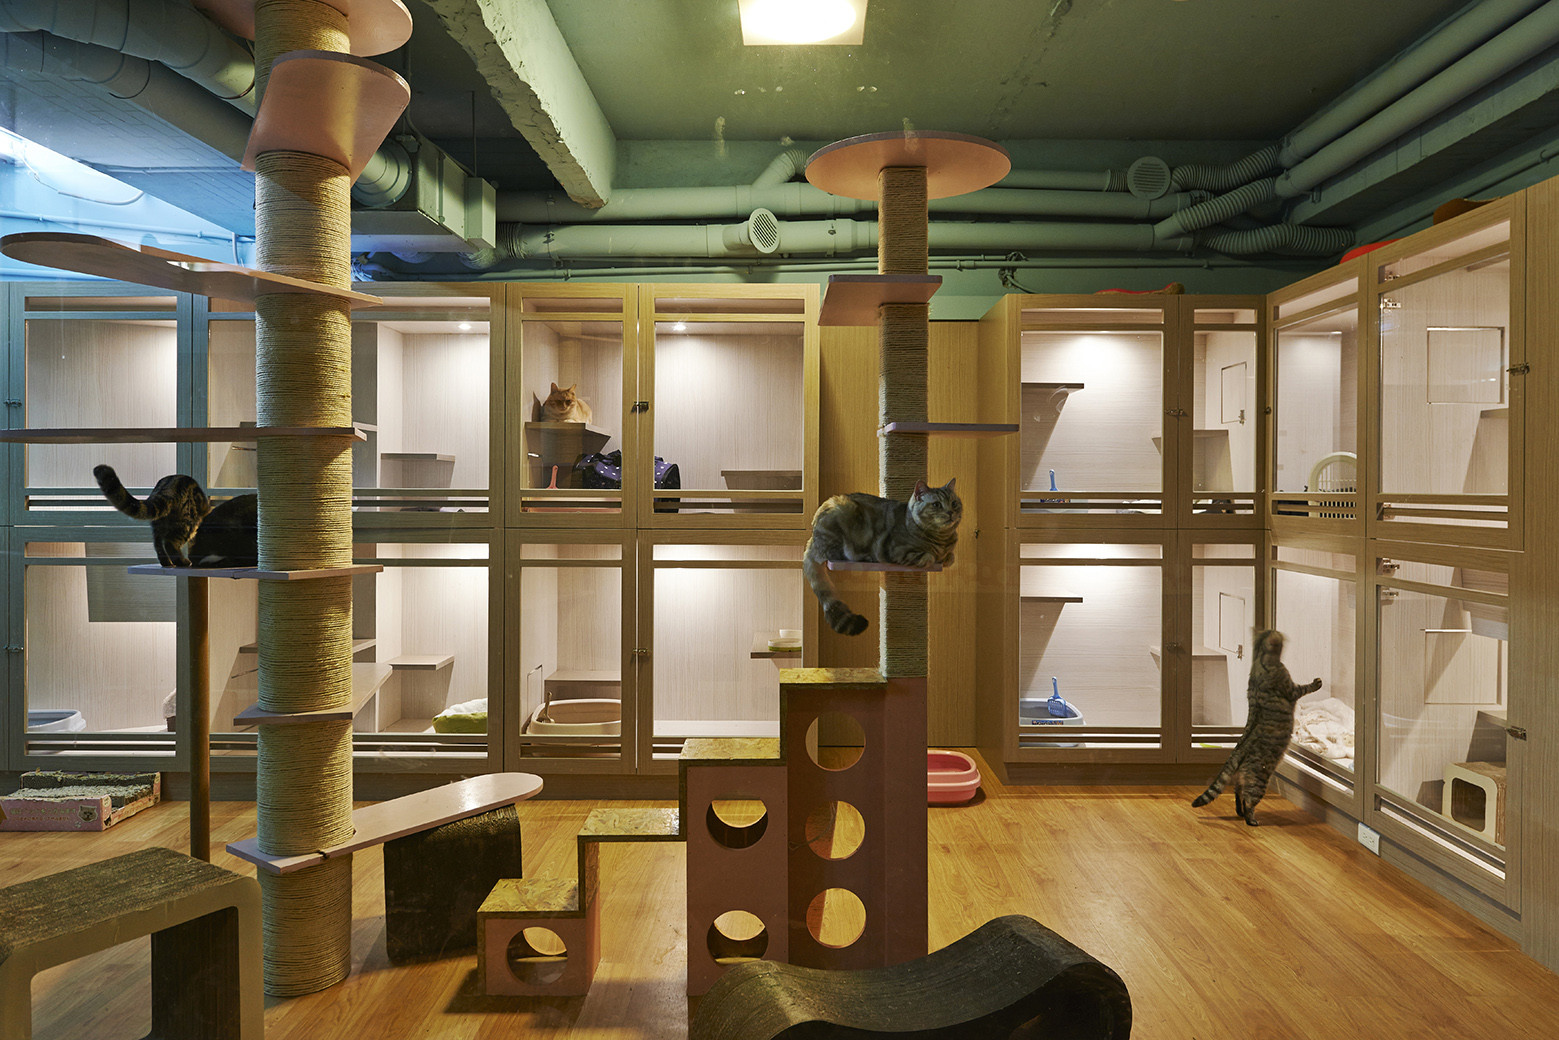 Gallery of Petaholic Hotel / sms design - 6